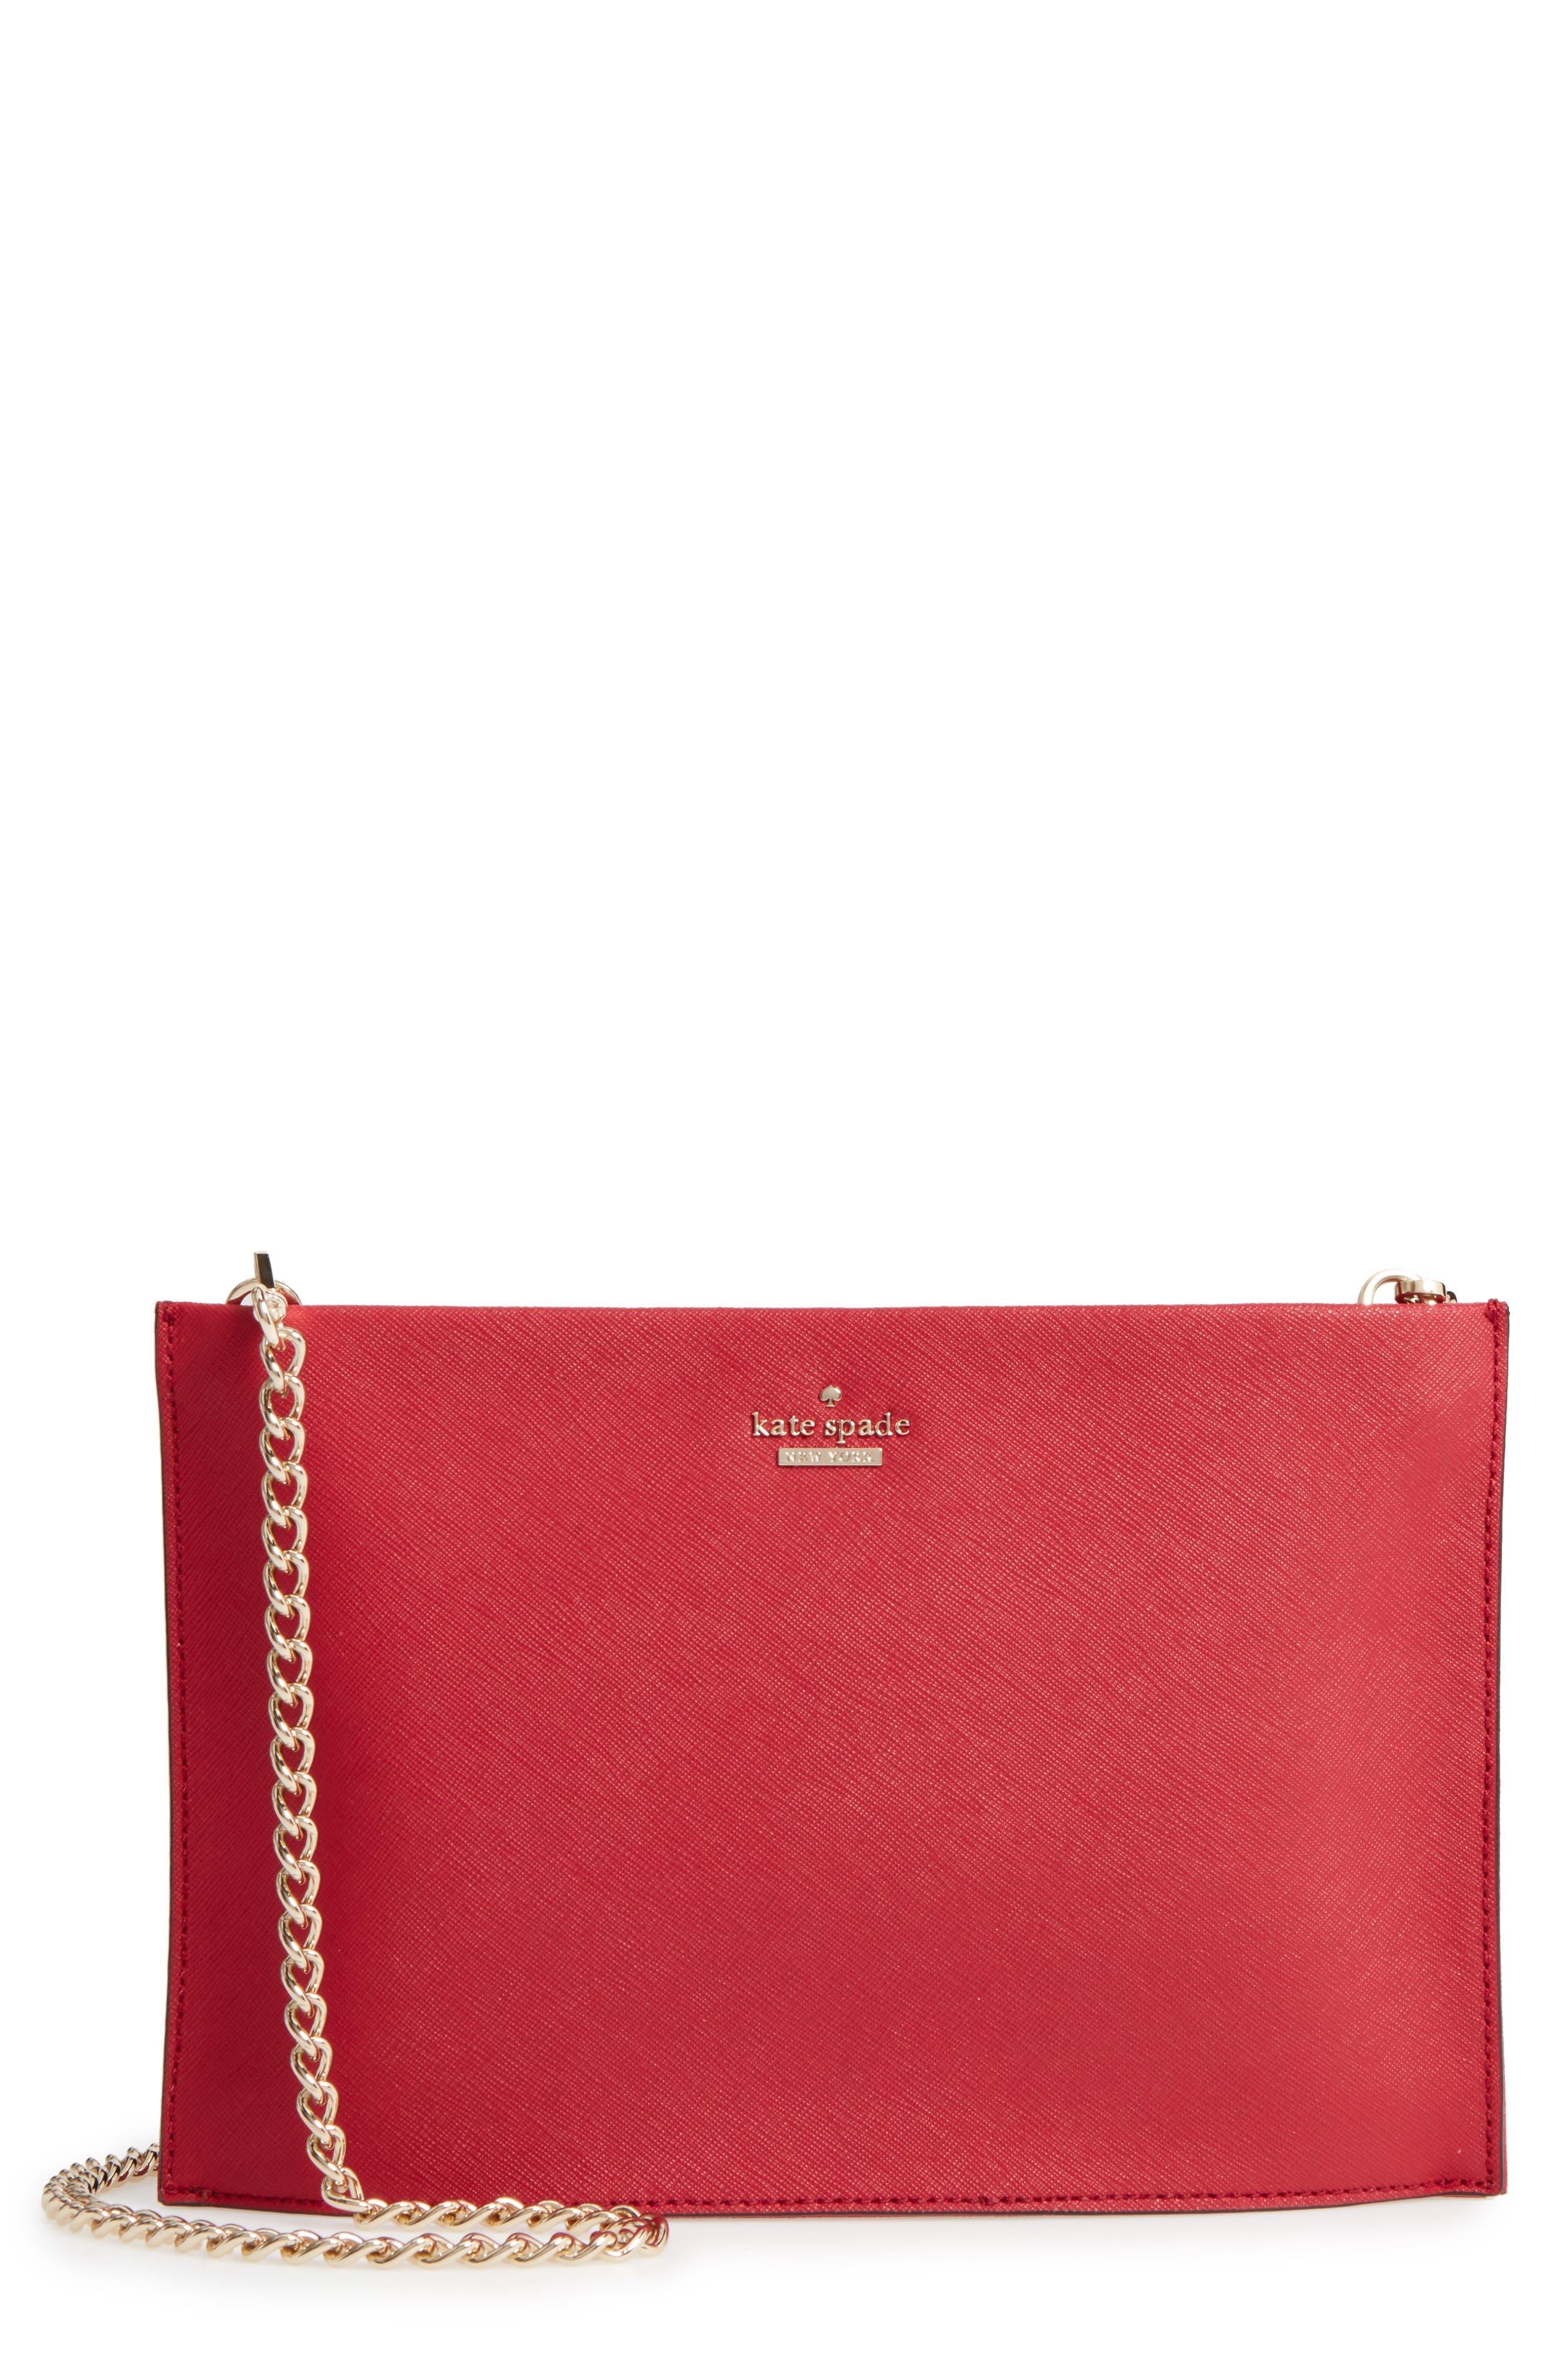 kate spade new york cameron street - sima leather shoulder bag